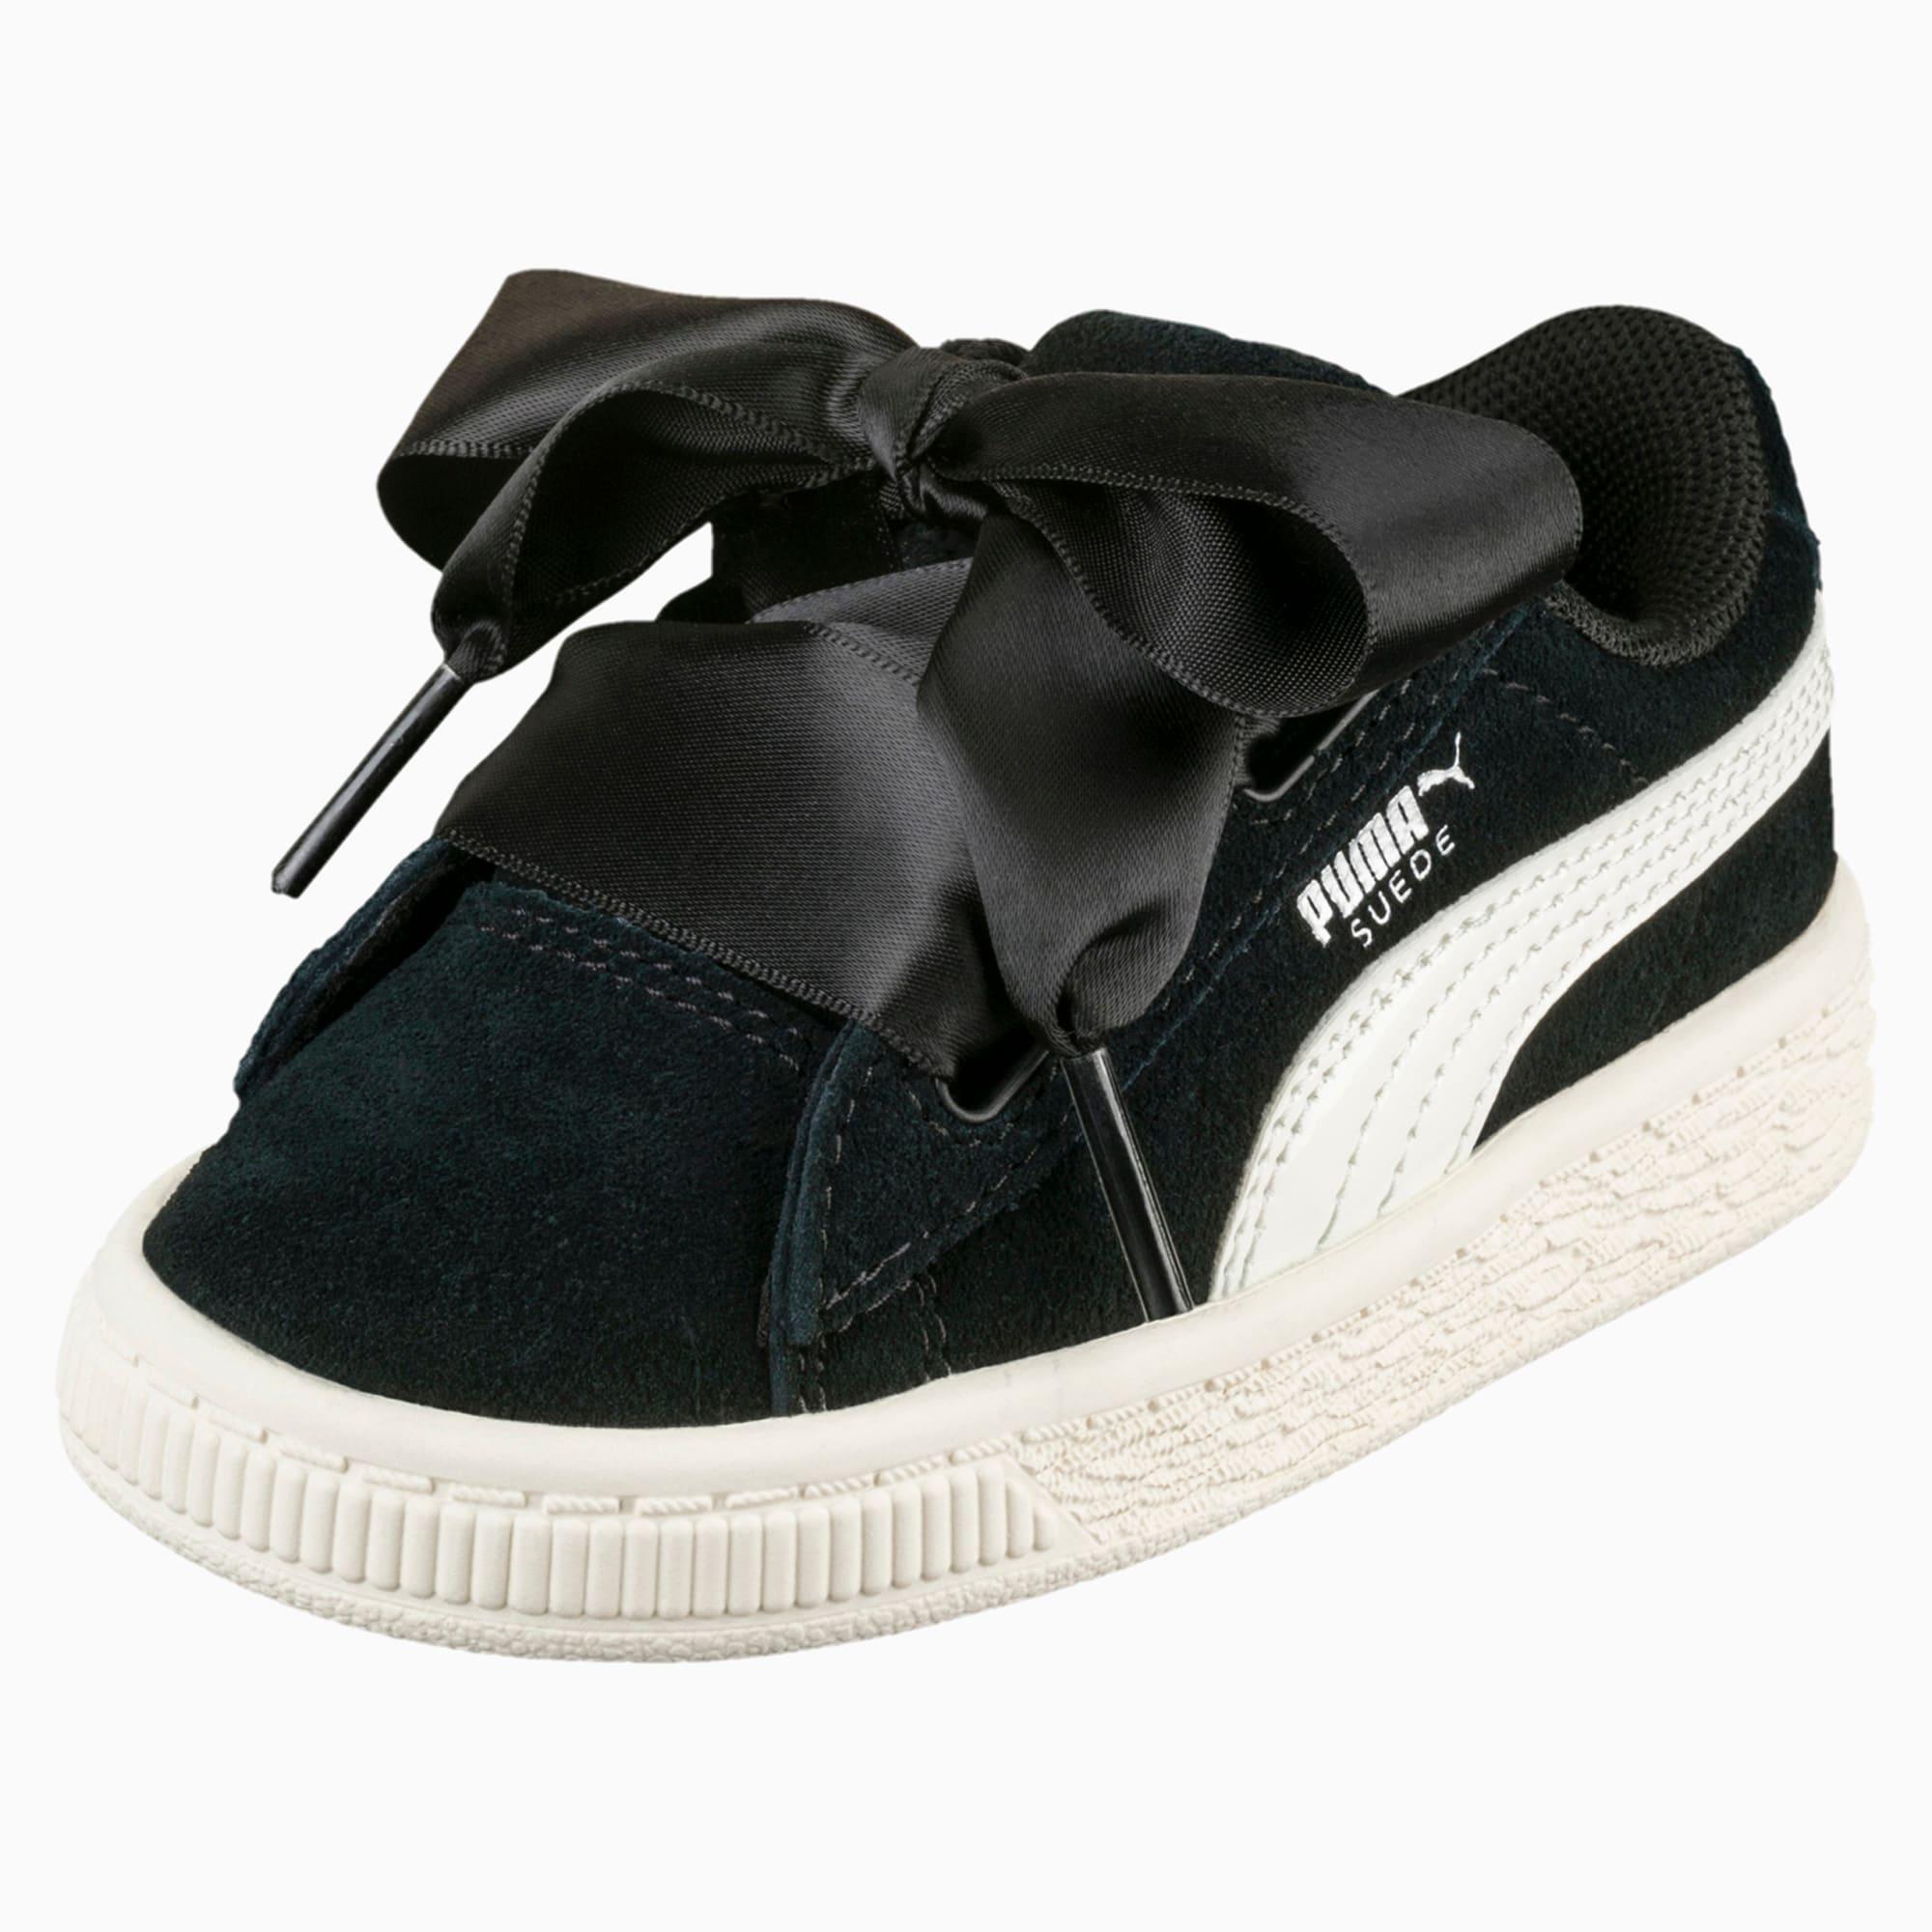 chaussure puma enfant fille heart